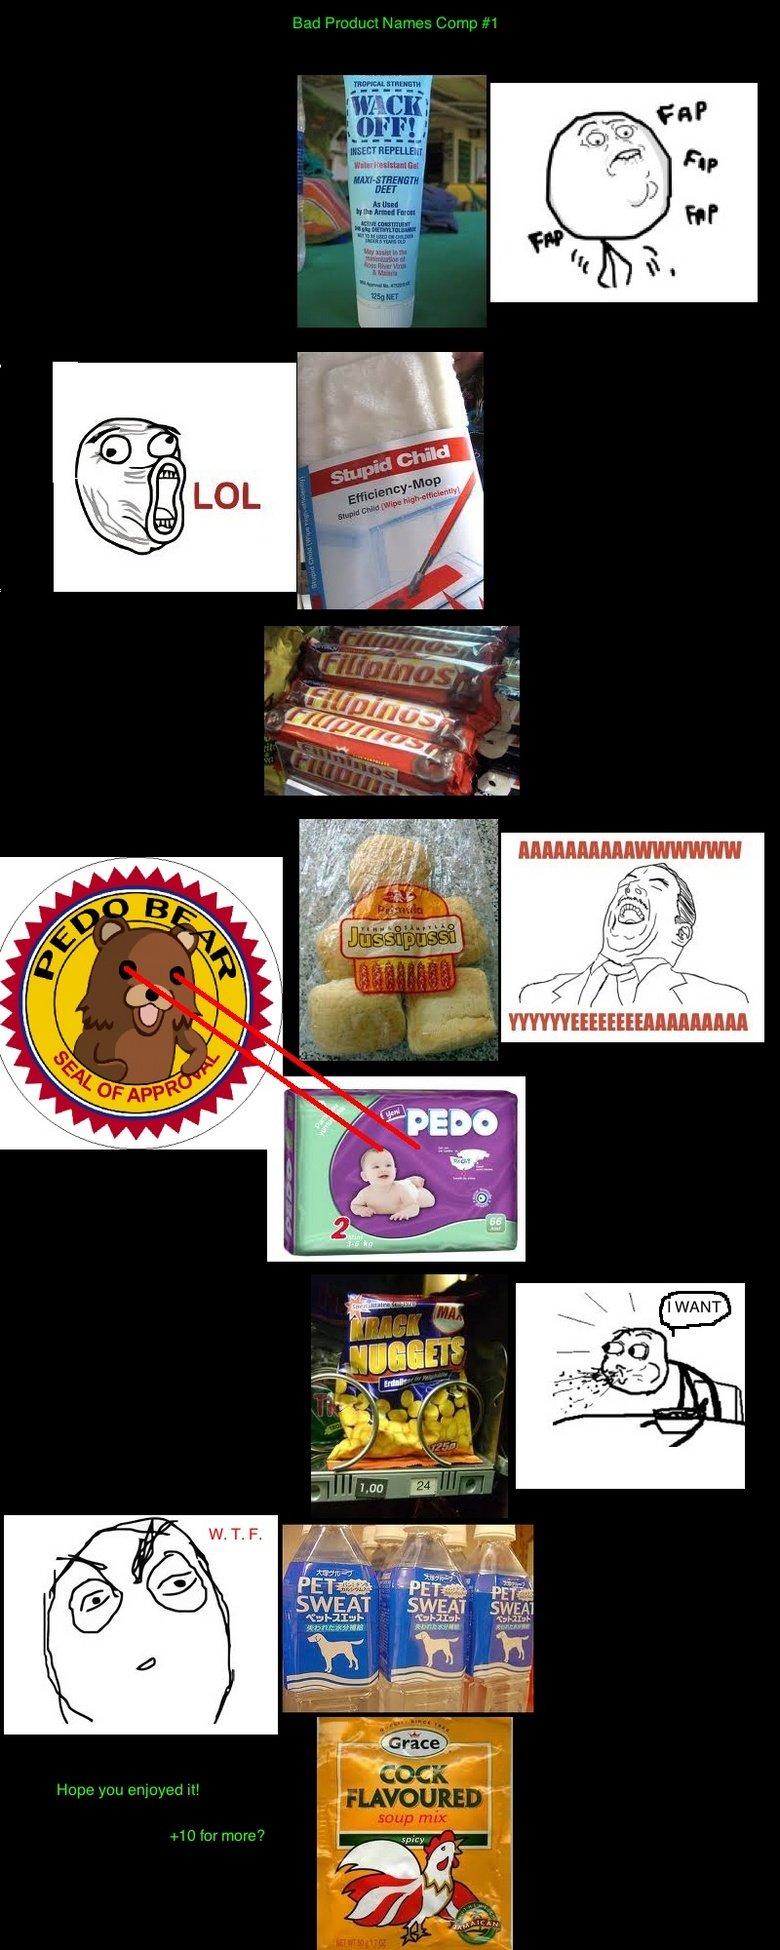 Bad Product Comp 1. Enjoy! Number 2- www.funnyjunk.com/funny_pictures/2548328/Bad+Product+Comp+2/ Number 3- www.funnyjunk.com/funny_pictures/2549748/Bad+Product